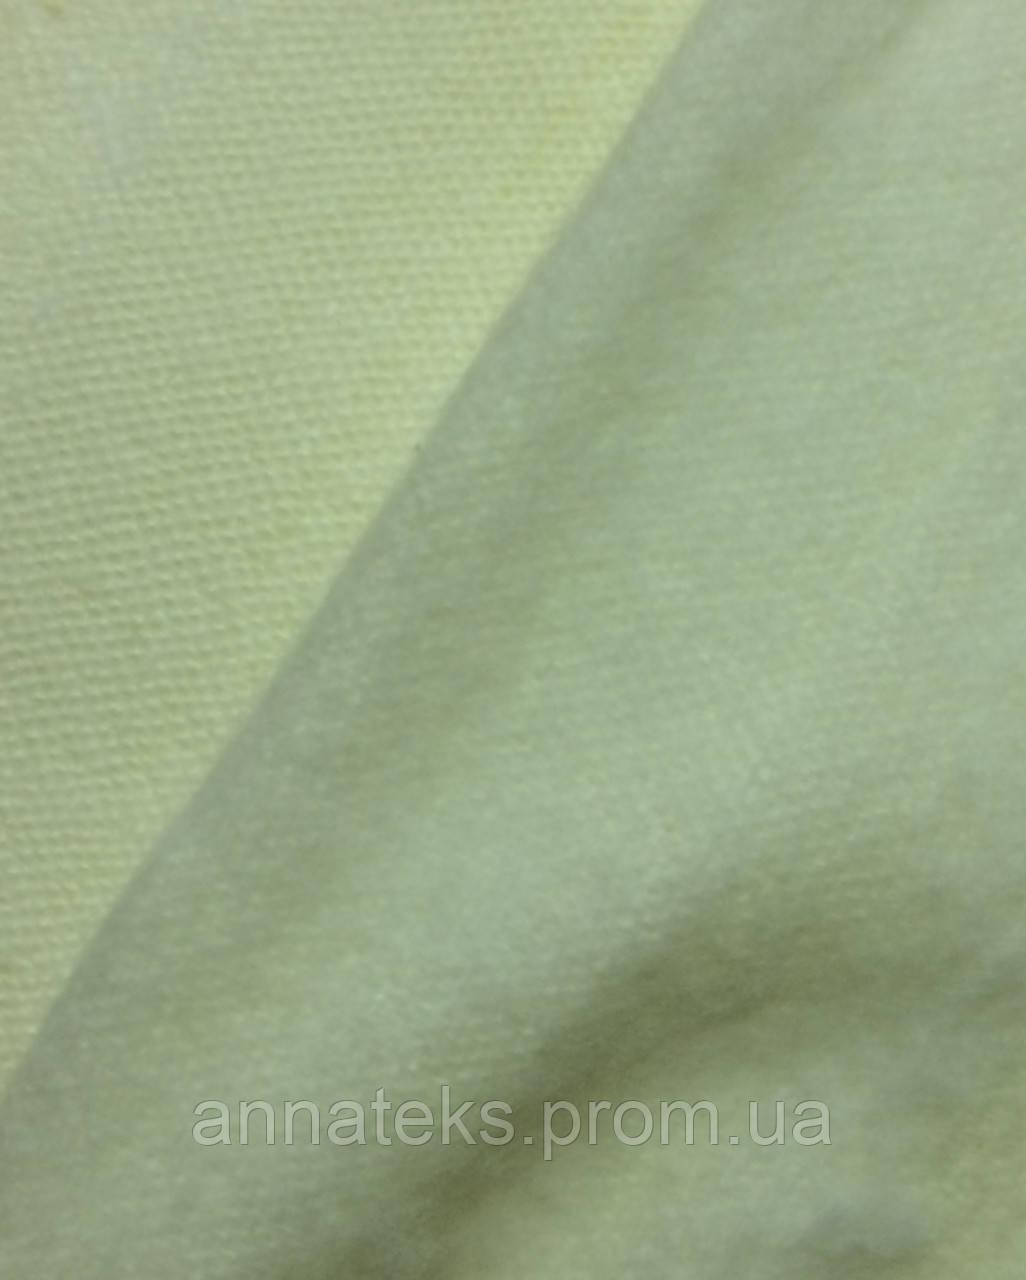 Ткань Фланель г/ф рис 514 жовтый Ш  90СМ арт 7801